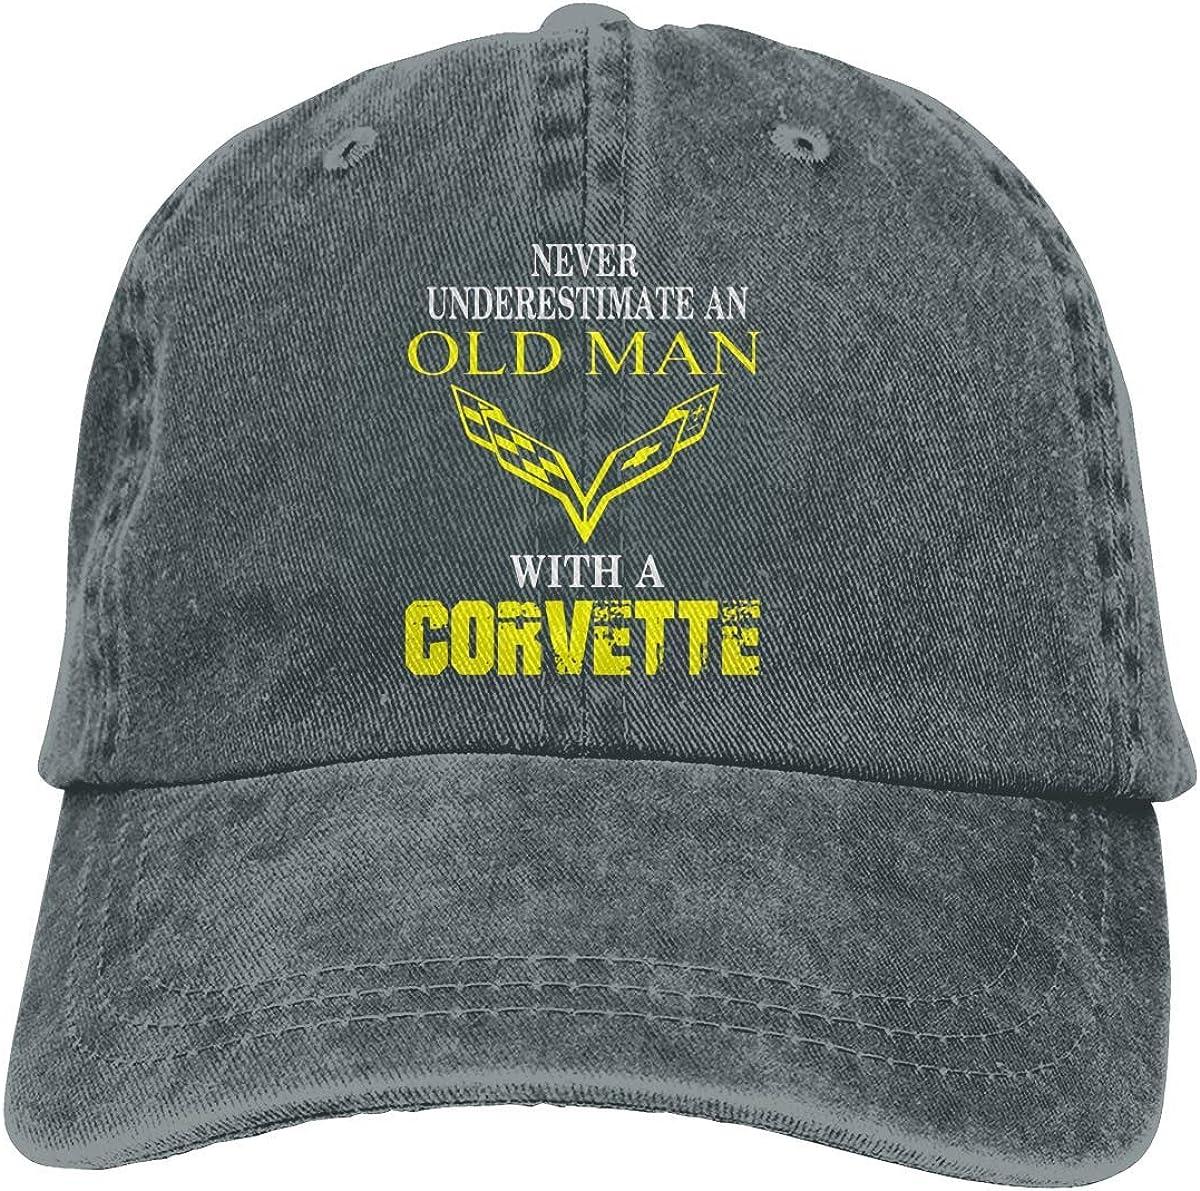 Never Underestimate an Old Man with A Corvette Denim Cap Plain Baseball Hat Black